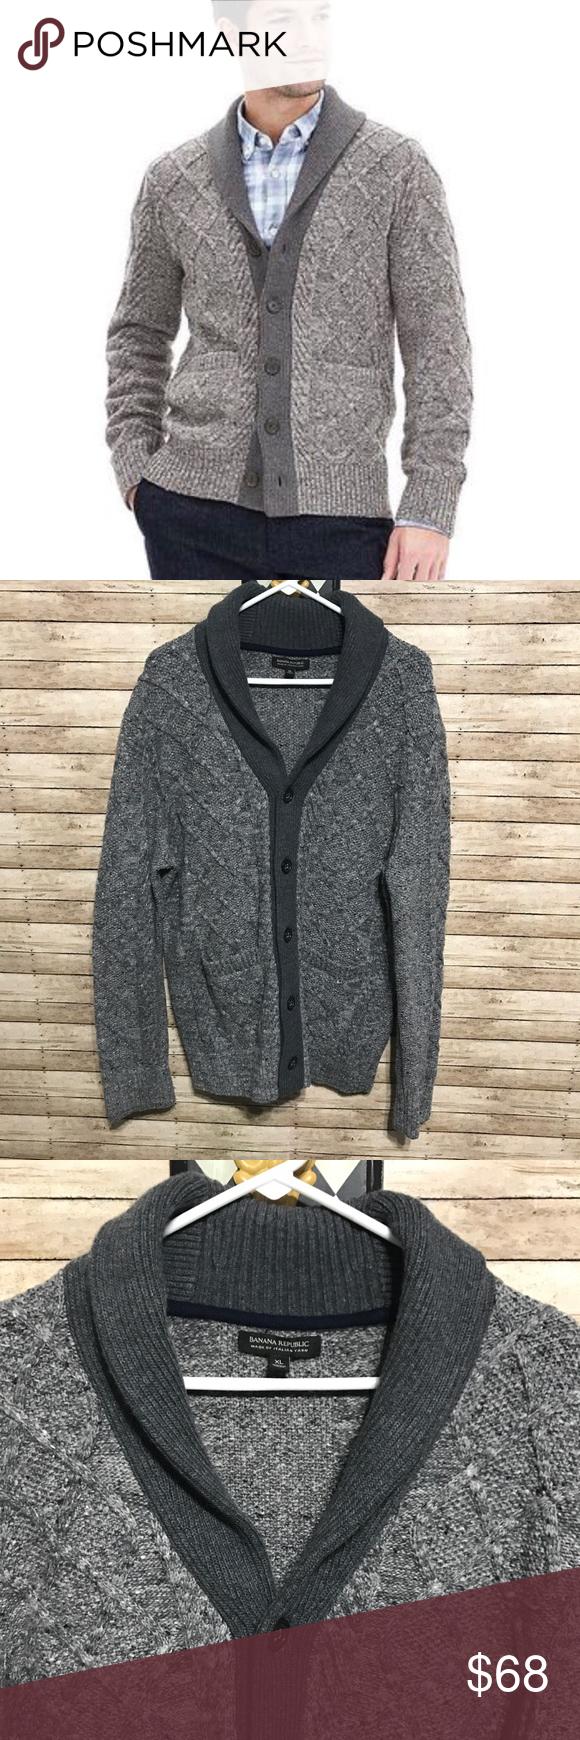 Banana Republic Cableknit Cardigan Sweater Xl Contrasting Dark Gray Collar Cable Knit Pattern Two Grey Cardigan Sweater Mens Grey Cardigan Clothes Design [ 1740 x 580 Pixel ]